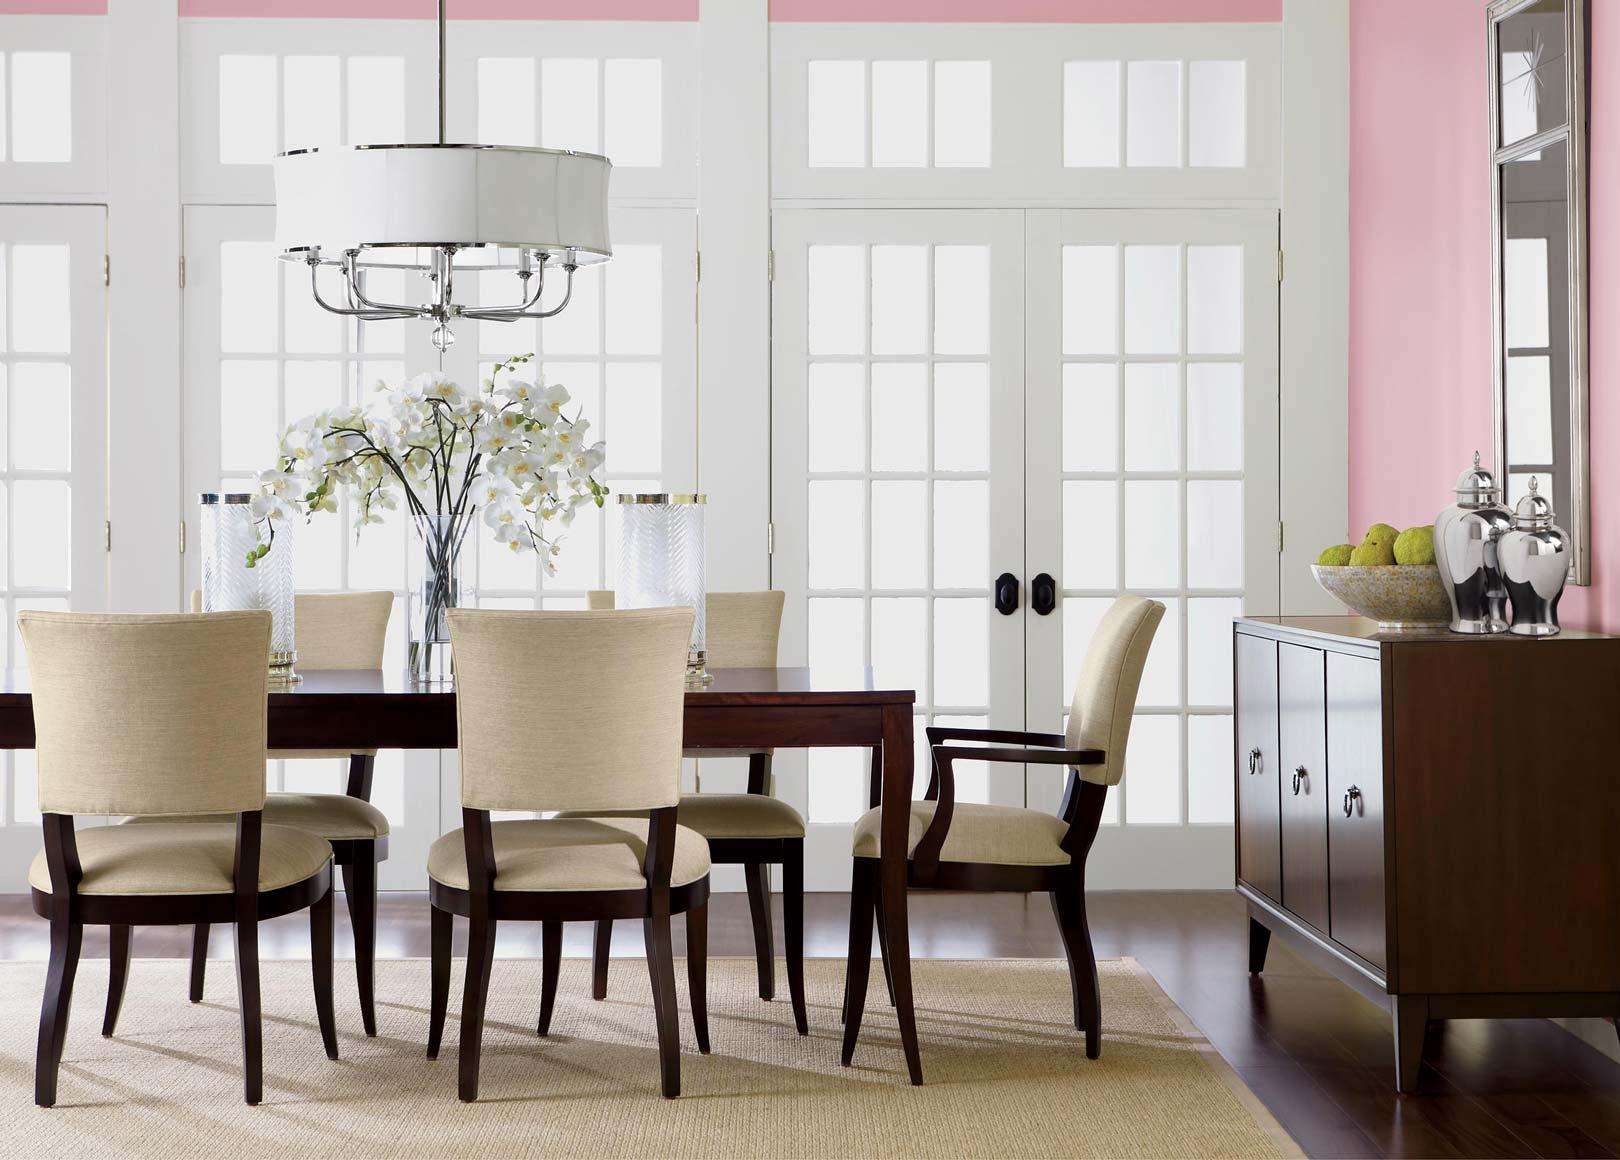 Uptown Dining Room | Ethan Allen